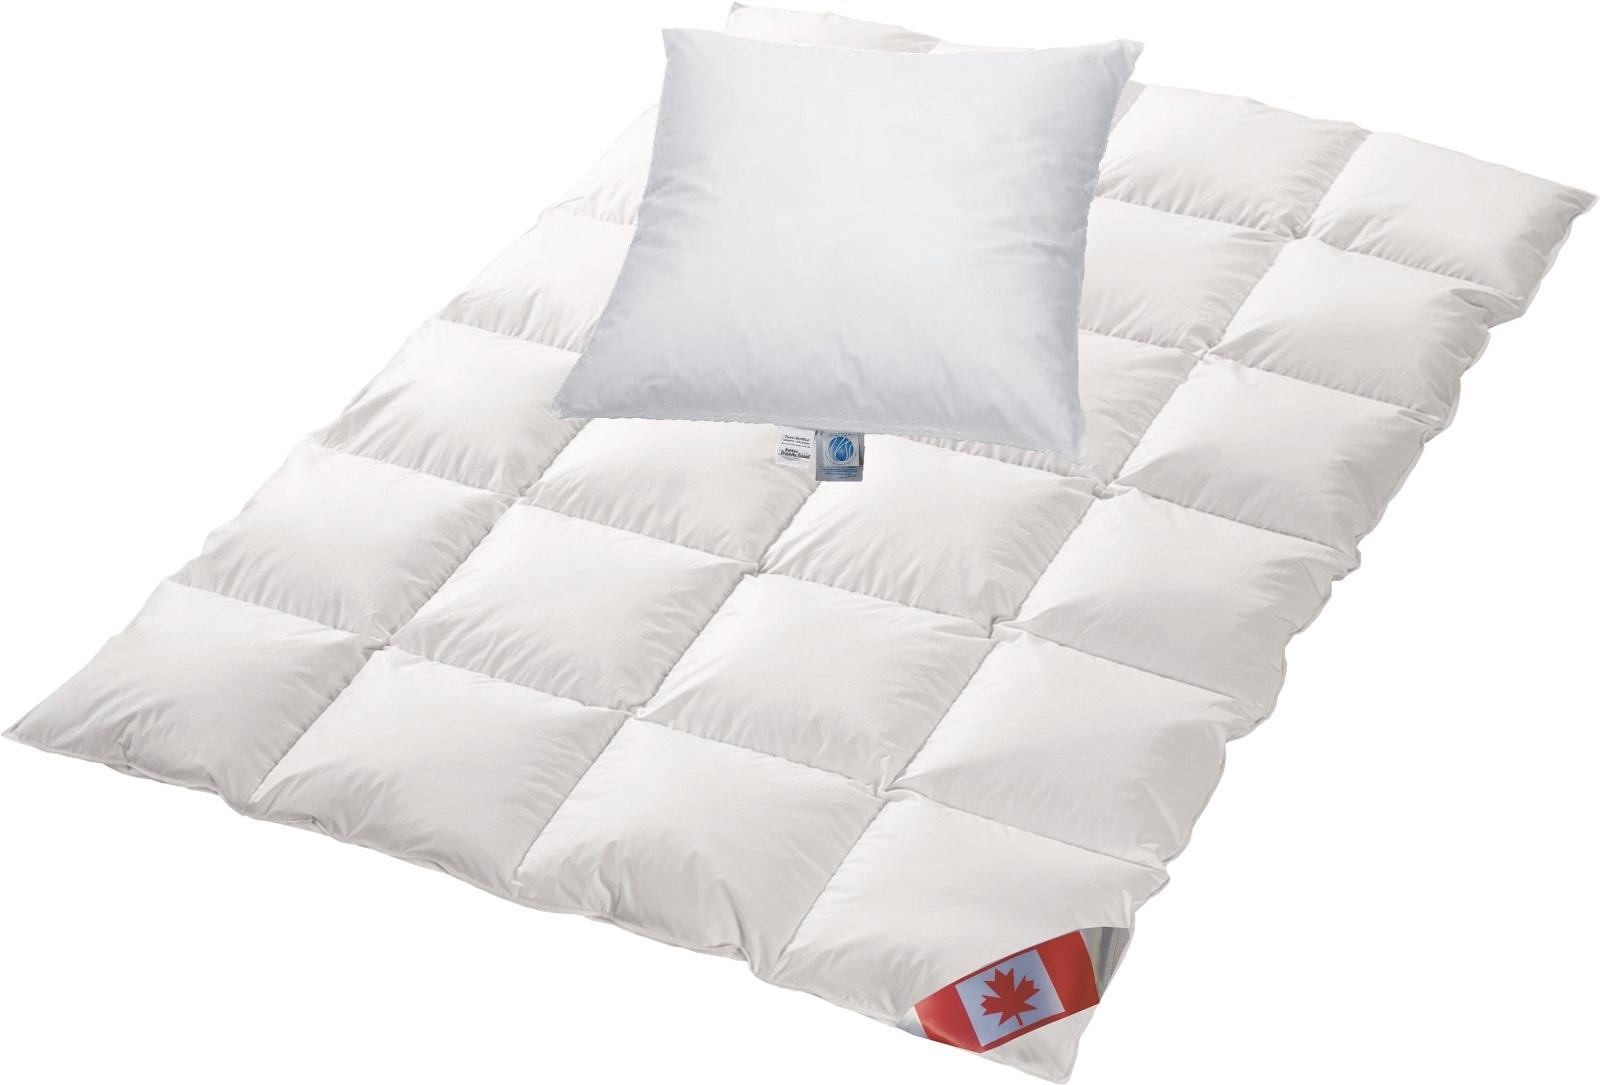 Angebot Canada warme Winterdecke 100%Daune 135x200 R4 + Kissen 80x80 BASIC